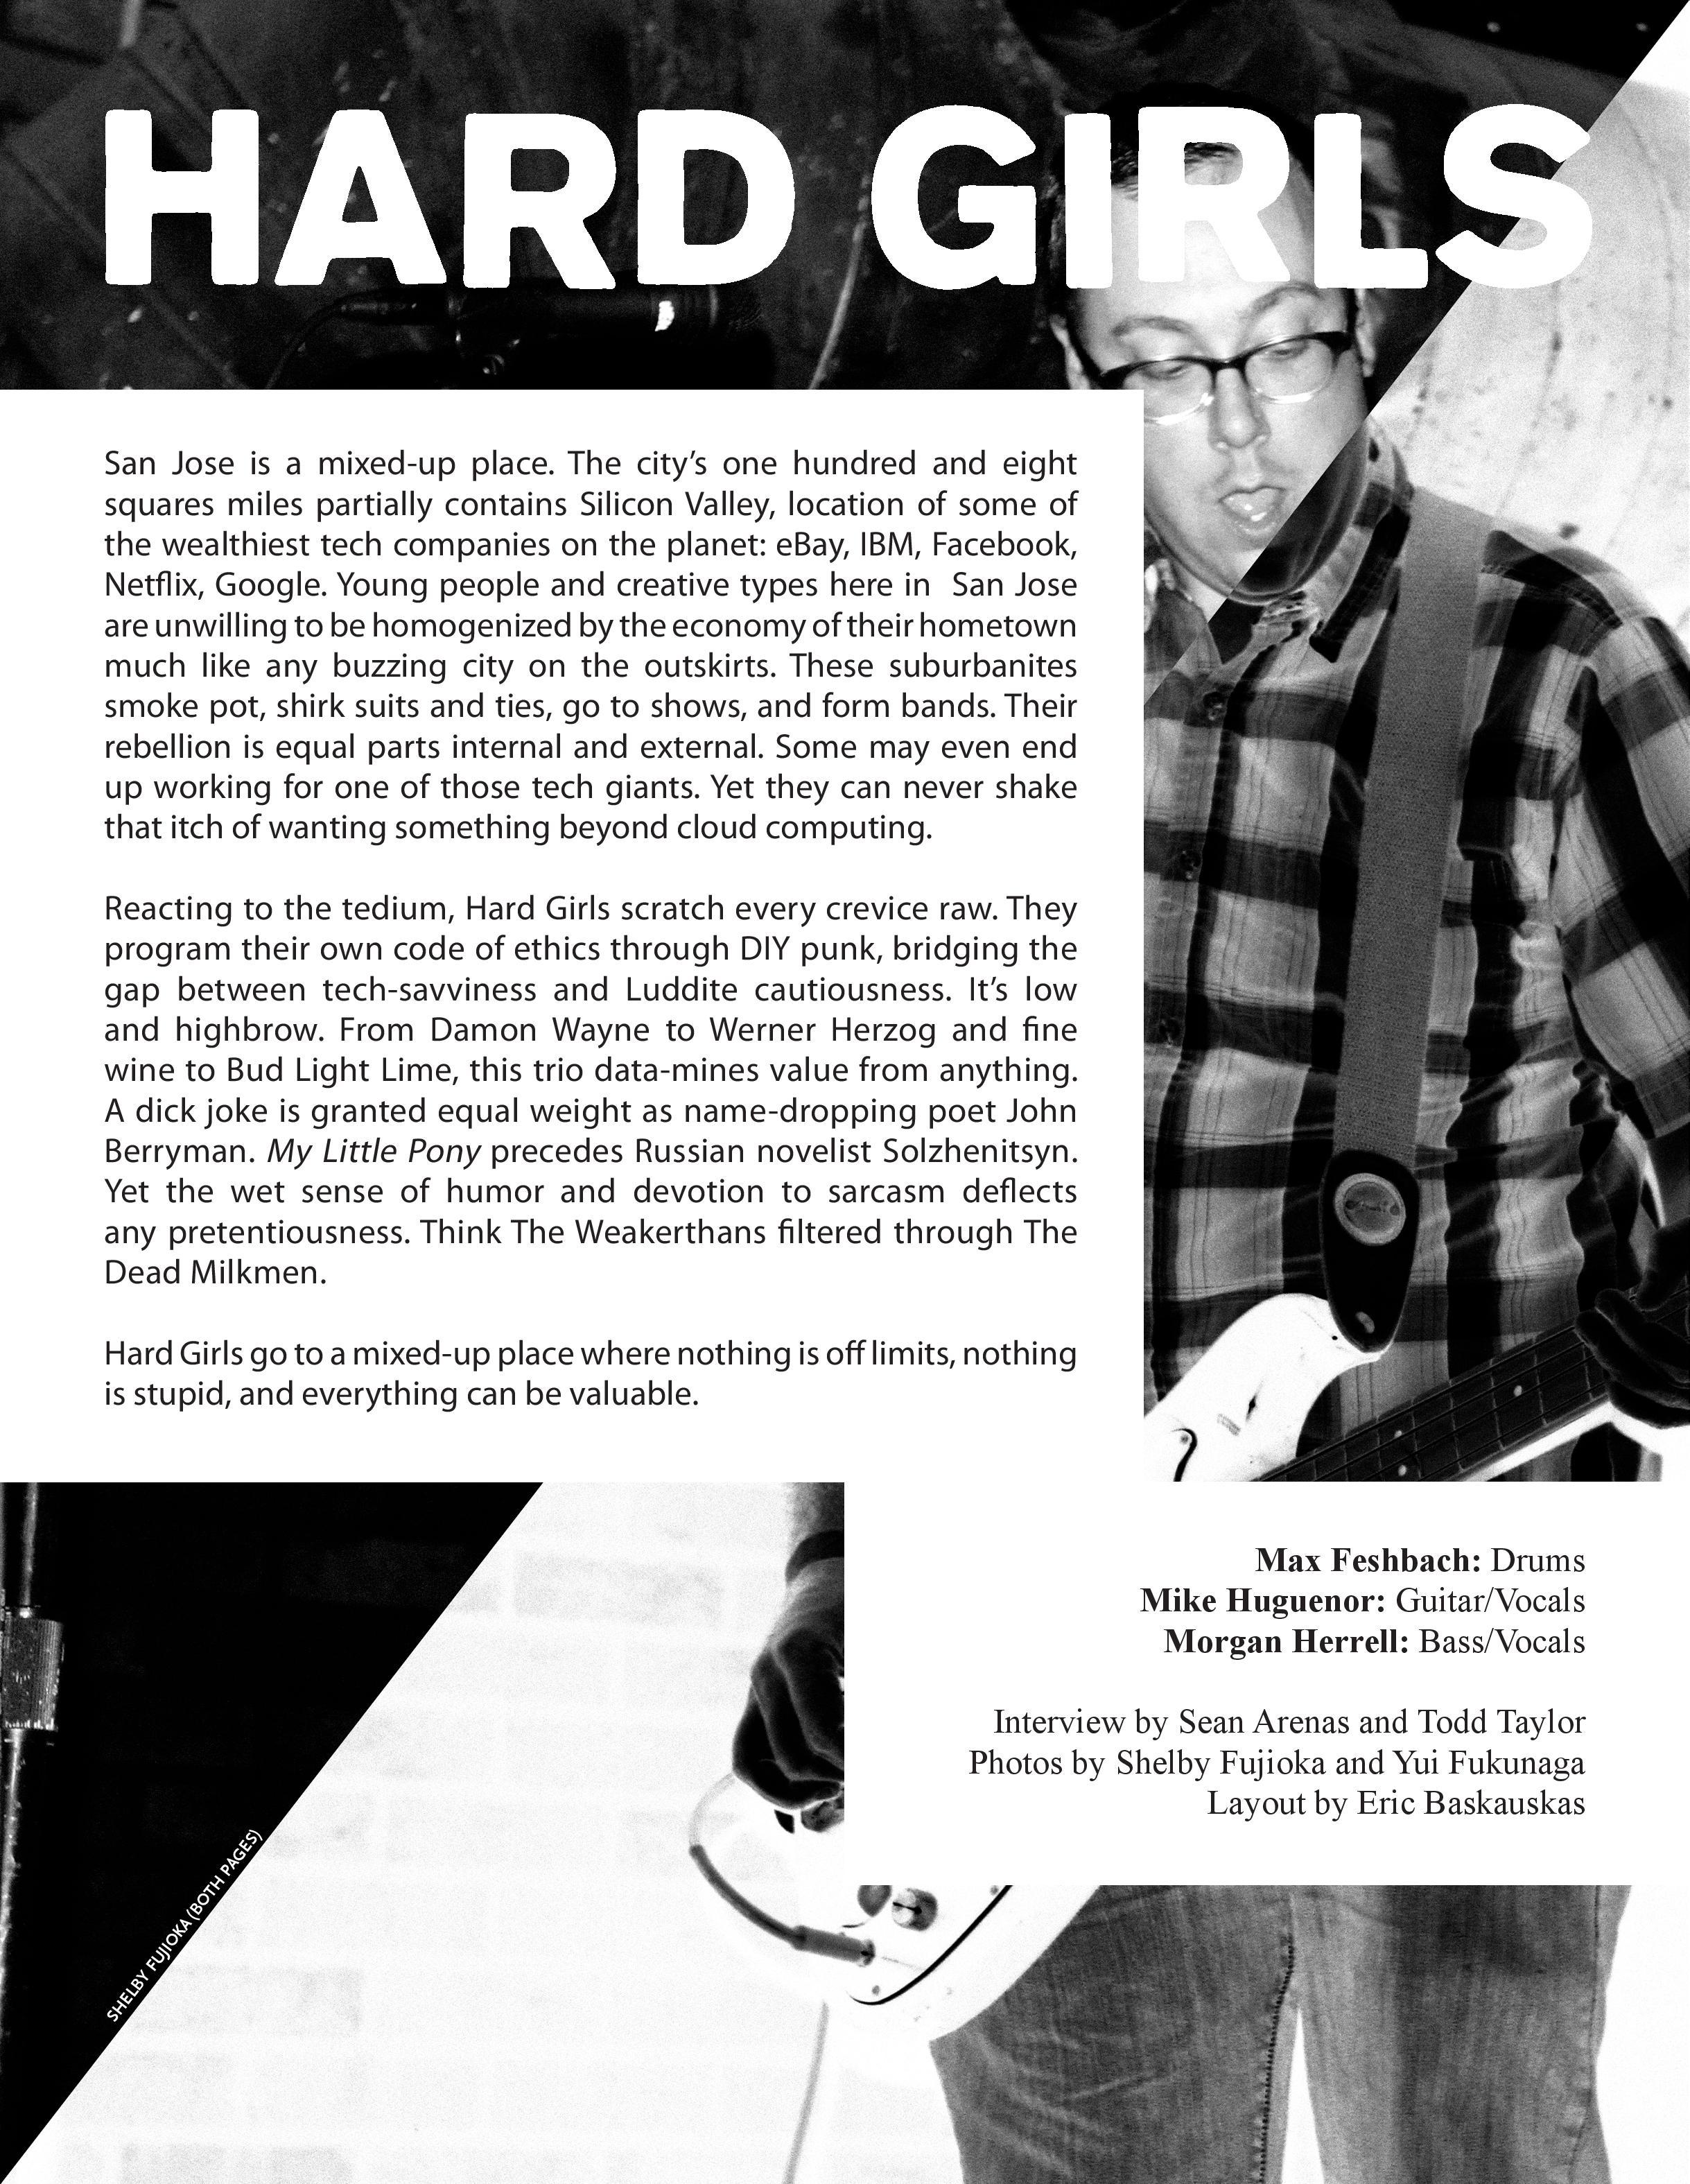 hard_girls_interview-page-001.jpg